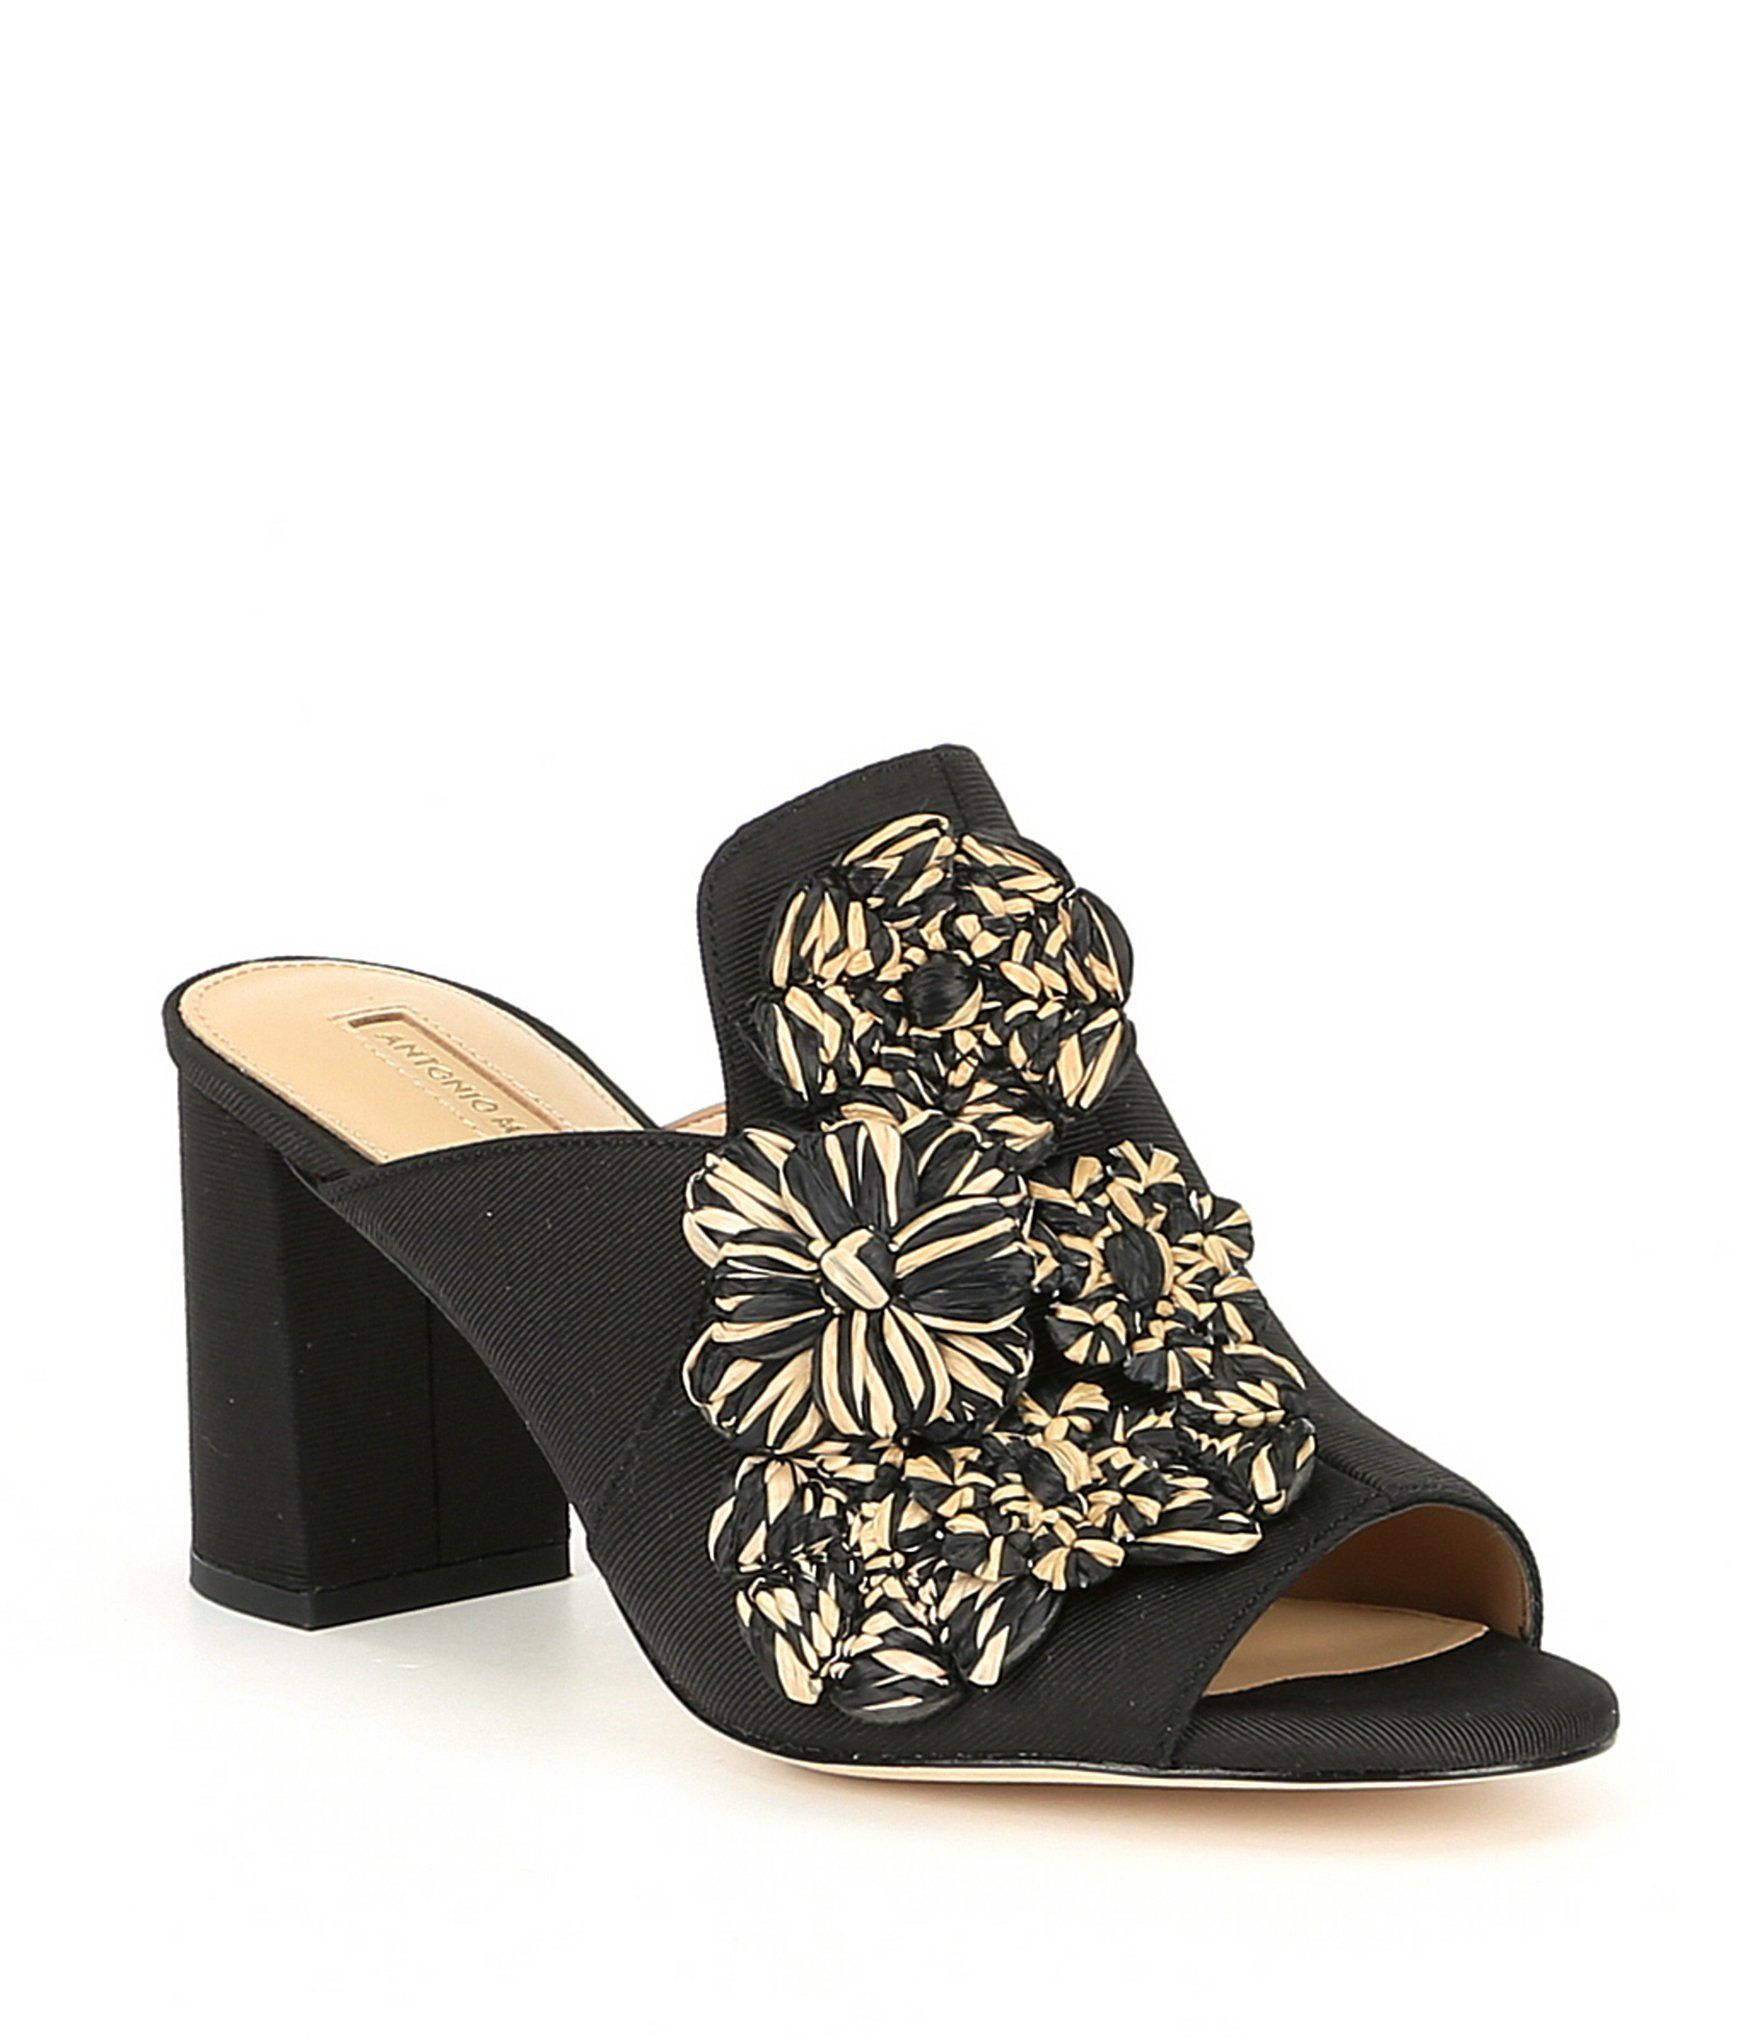 37329e09ba07 Antonio Melani Barna Raffia Flower Embellished Block Heel Dress Mules